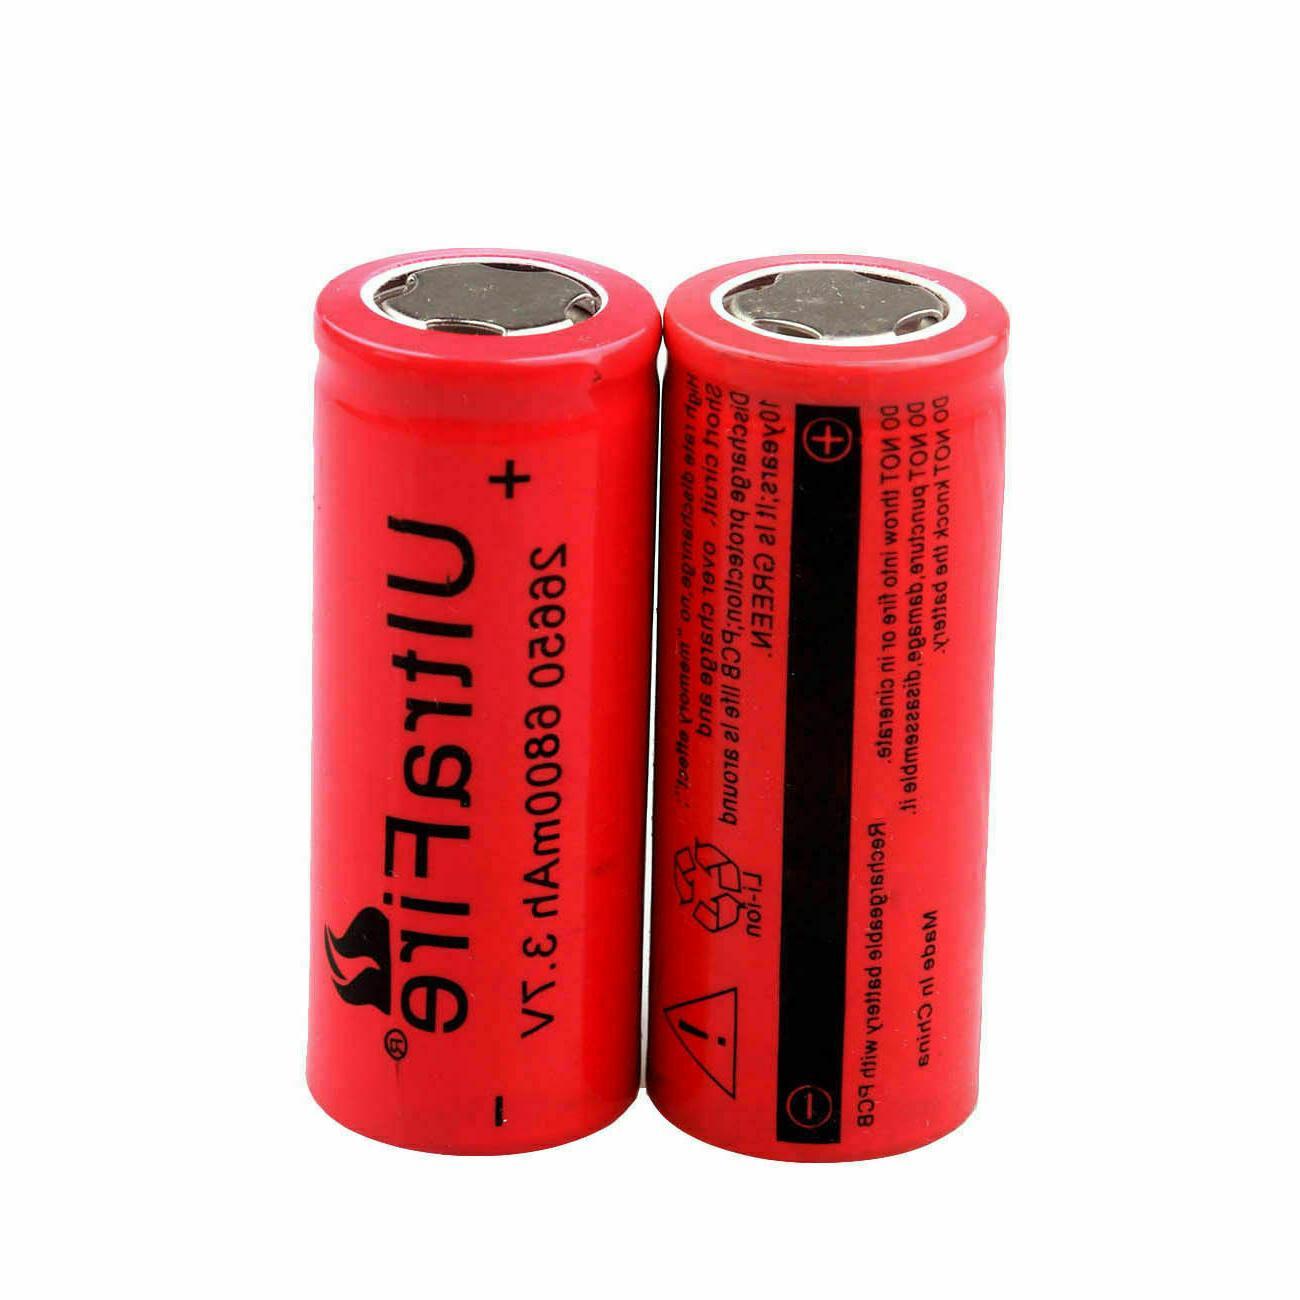 26650 6800mAh Flat Batteries Torch Lot